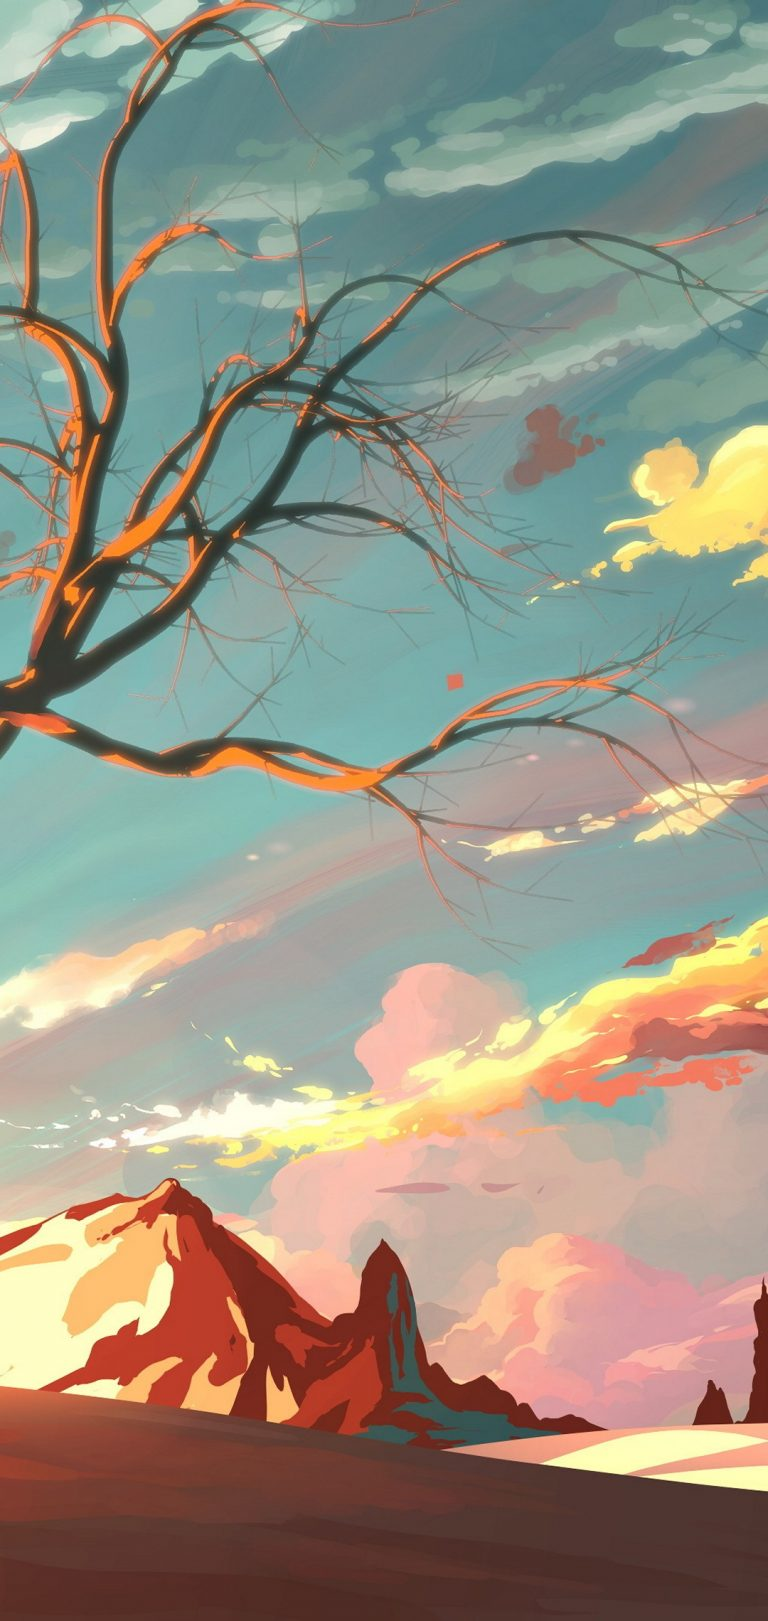 Artistic Landscape Wallpaper 1080x2280 768x1621